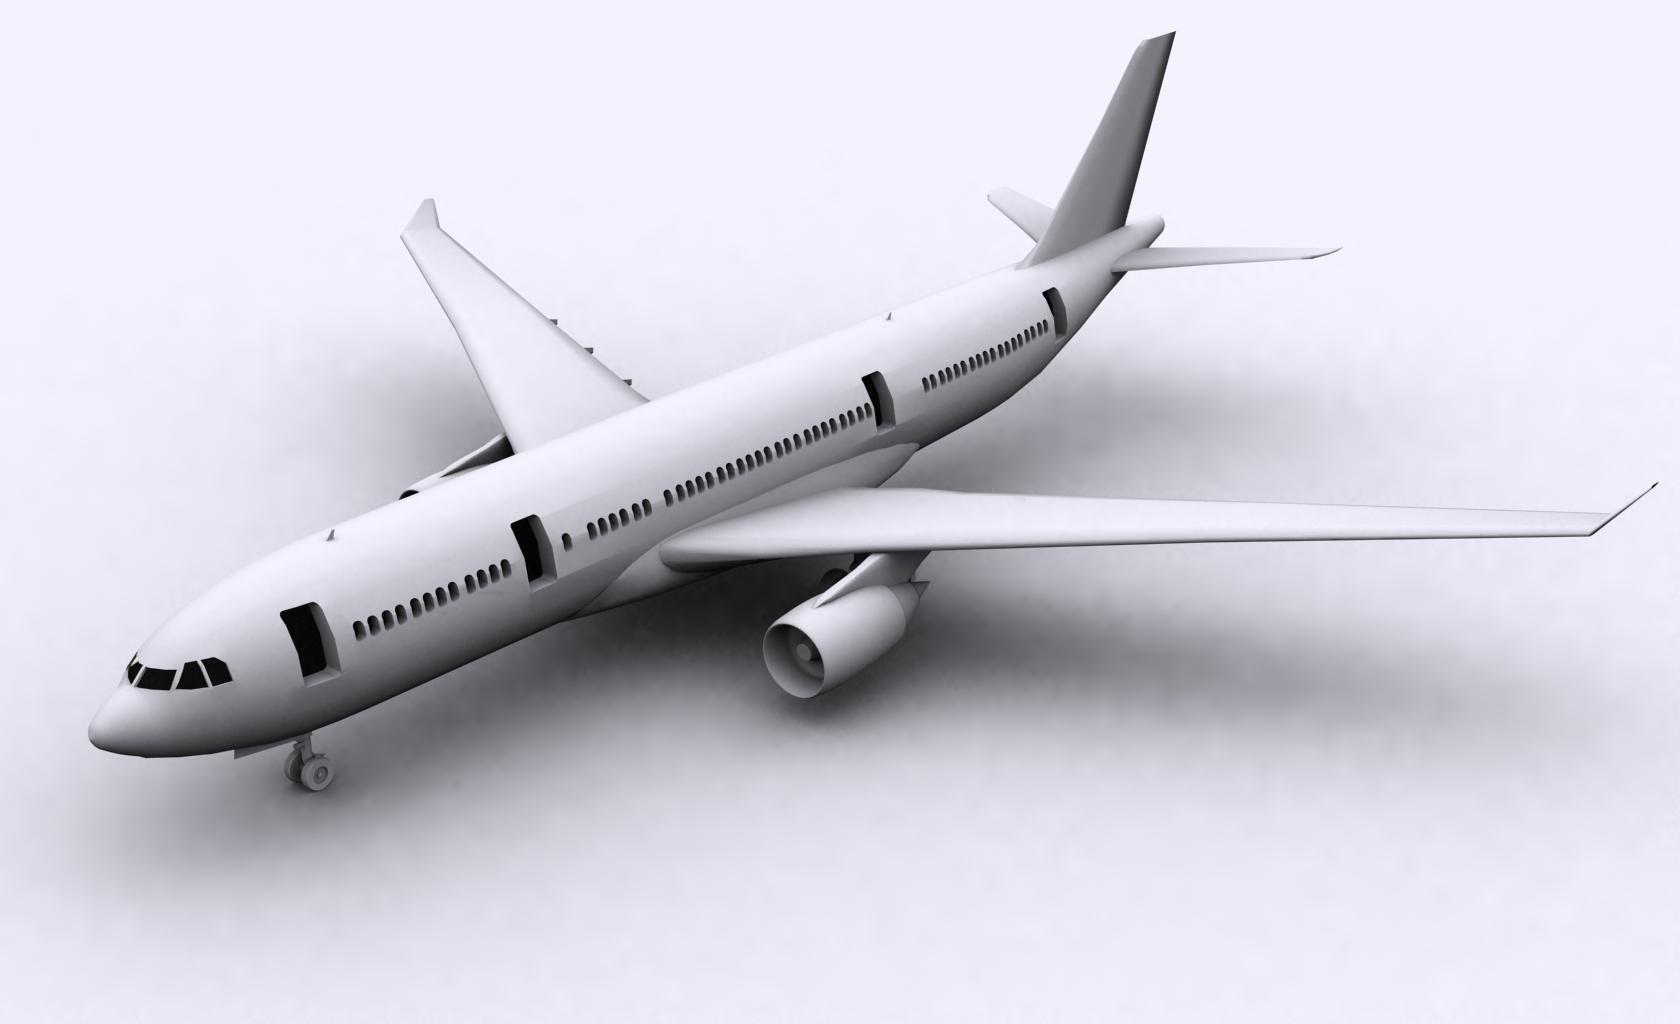 airbus a330-200 3d model ige igs iges obj 152718